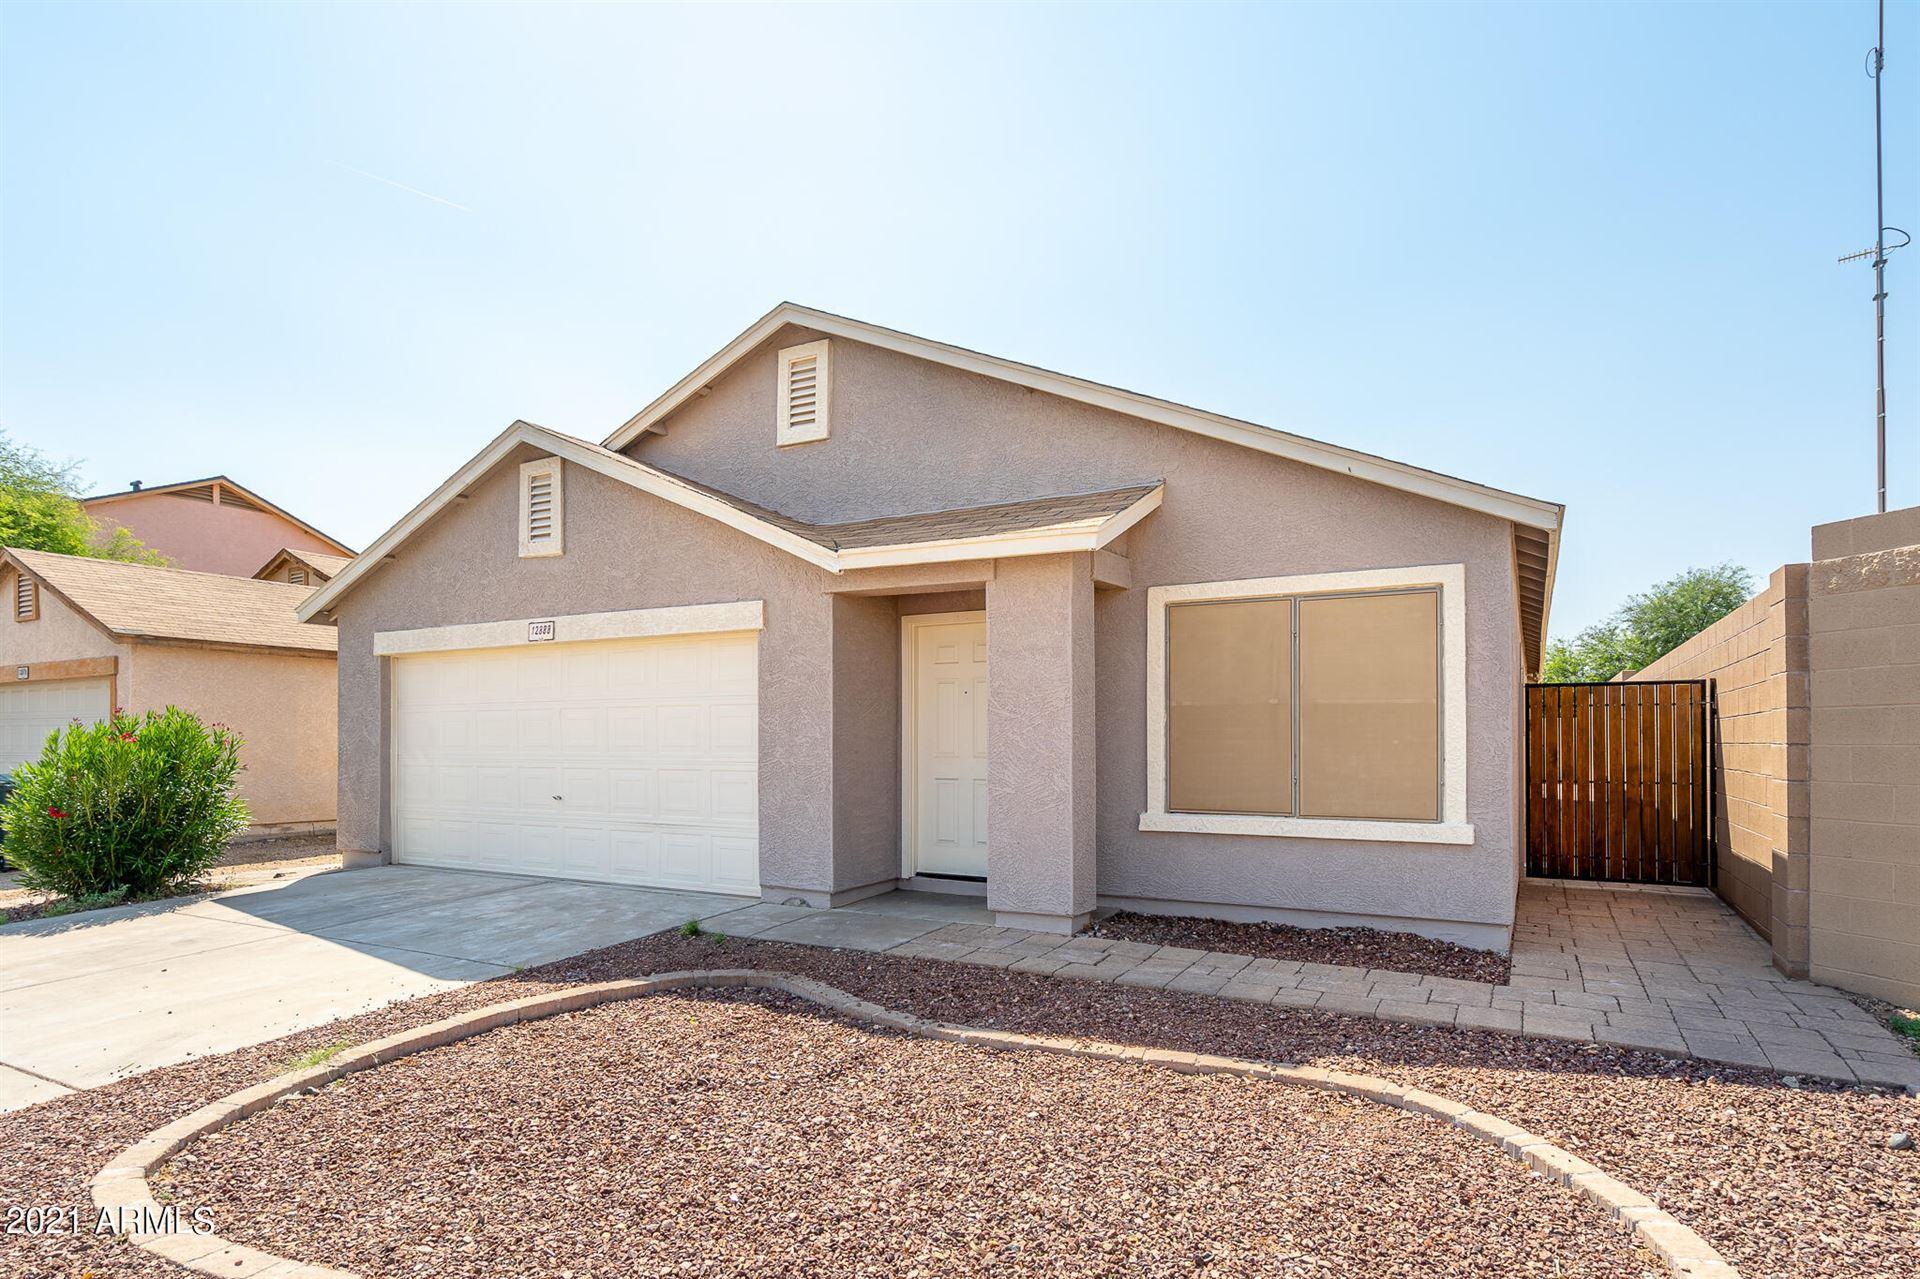 Photo of 12888 N B Street, El Mirage, AZ 85335 (MLS # 6292011)